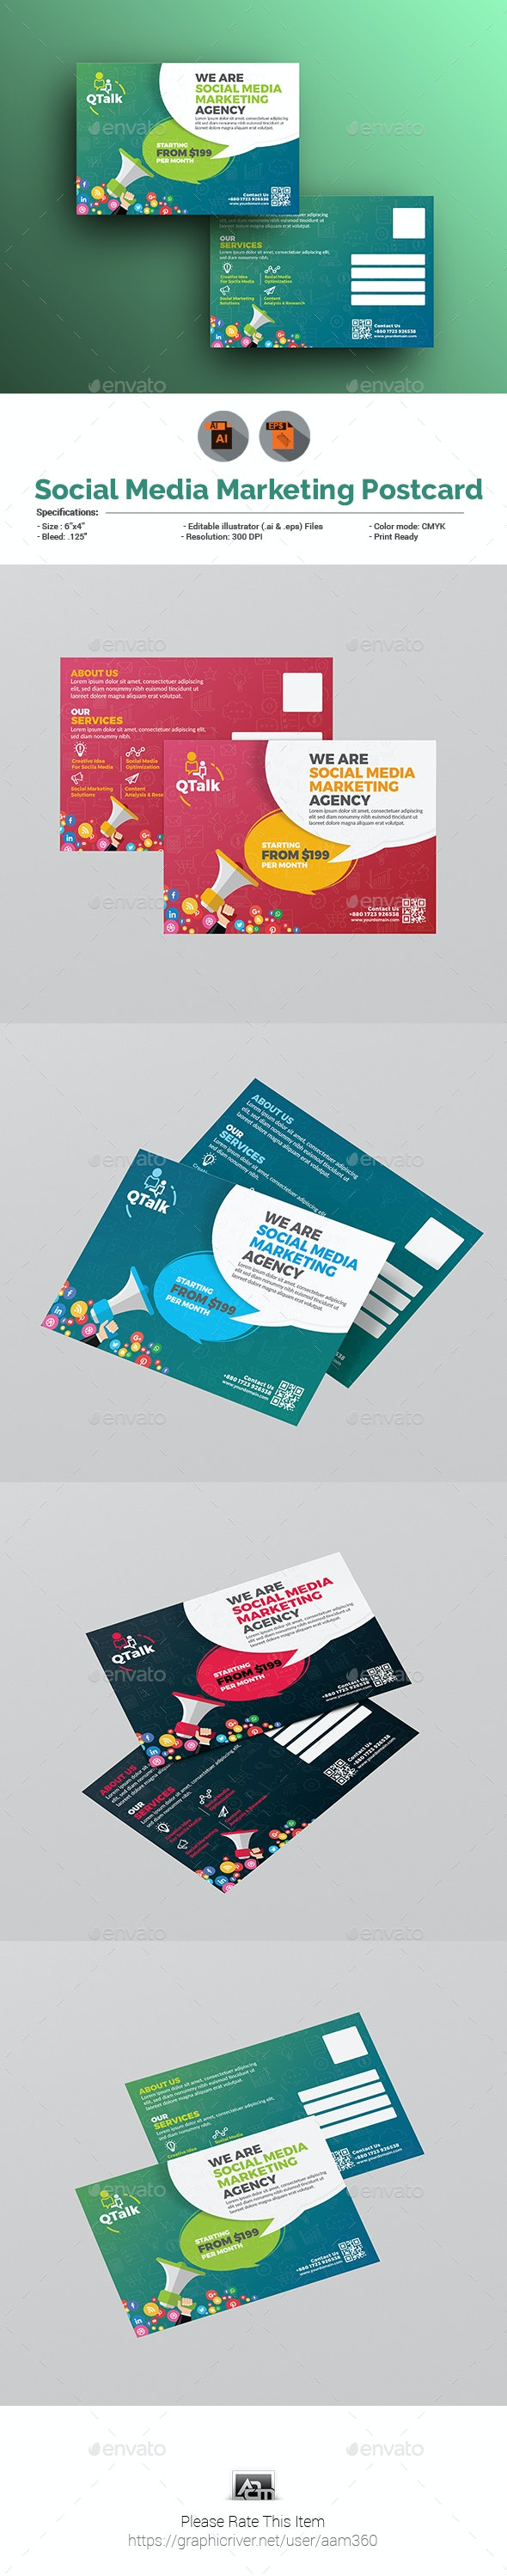 Social Media Marketing Postcard - Cards & Invites Print Templates